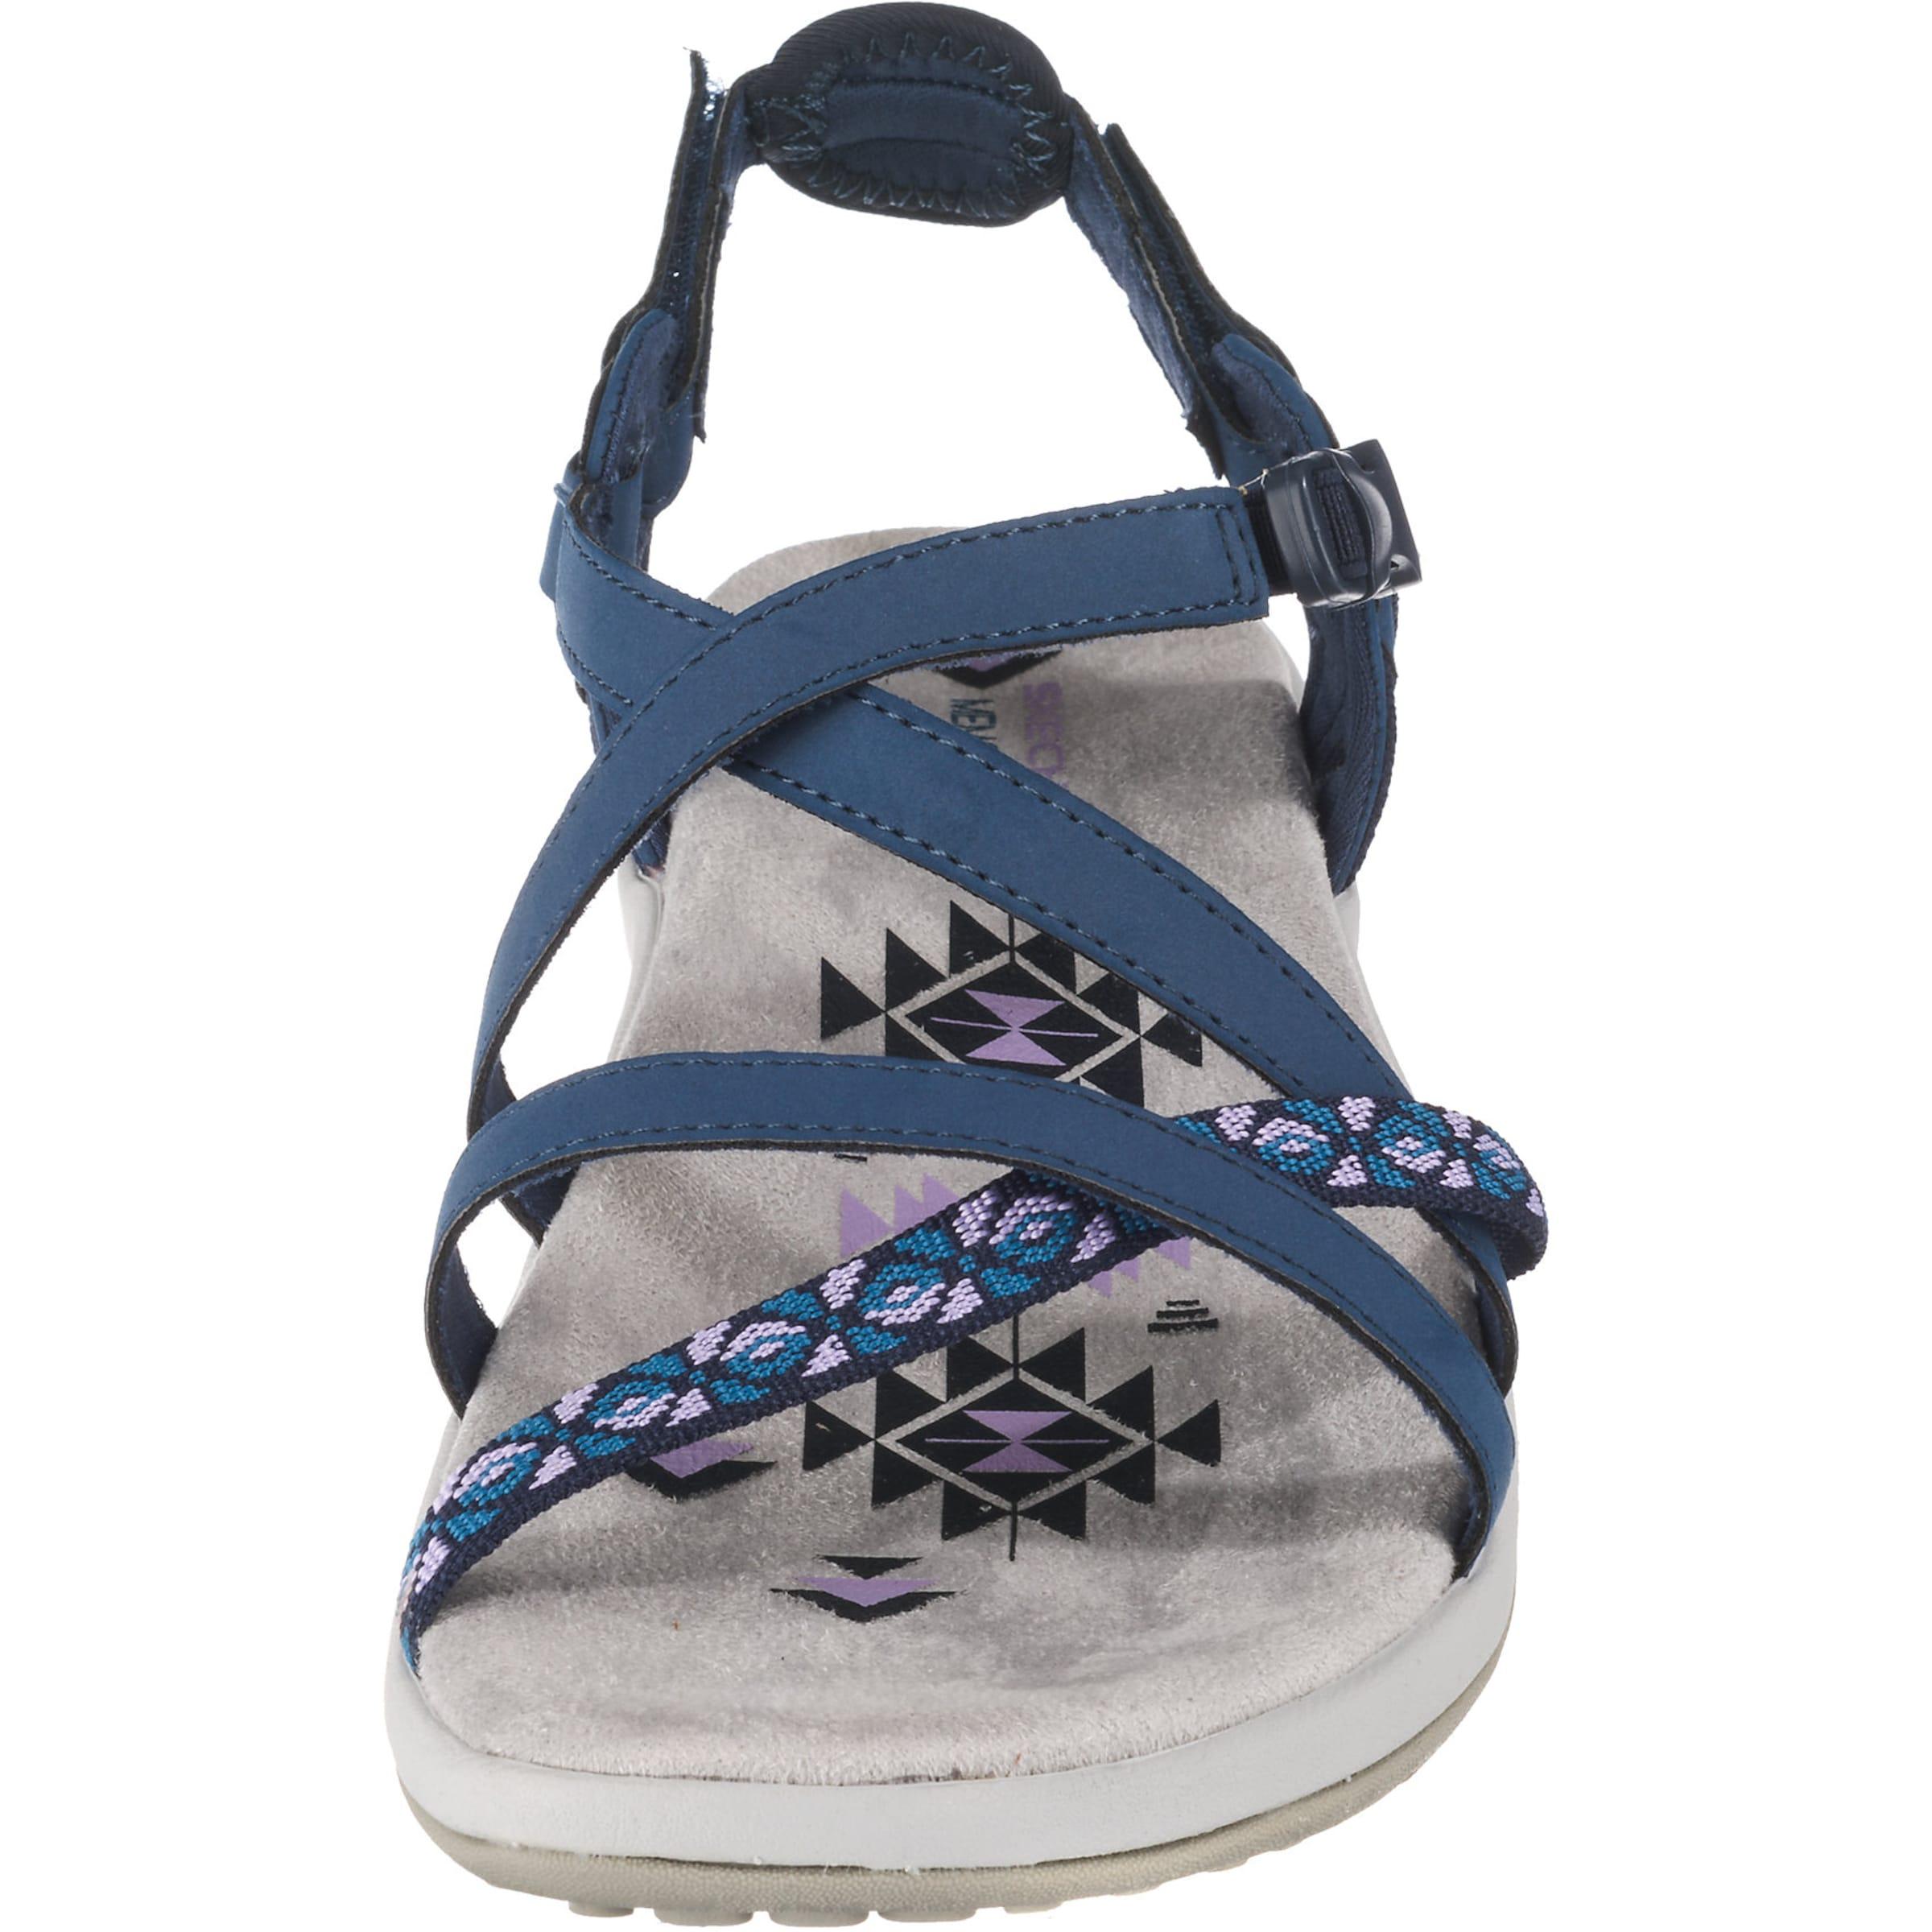 Sandale Skechers BlauAltrosa BlauAltrosa Sandale In Skechers In pGMLSzqUV